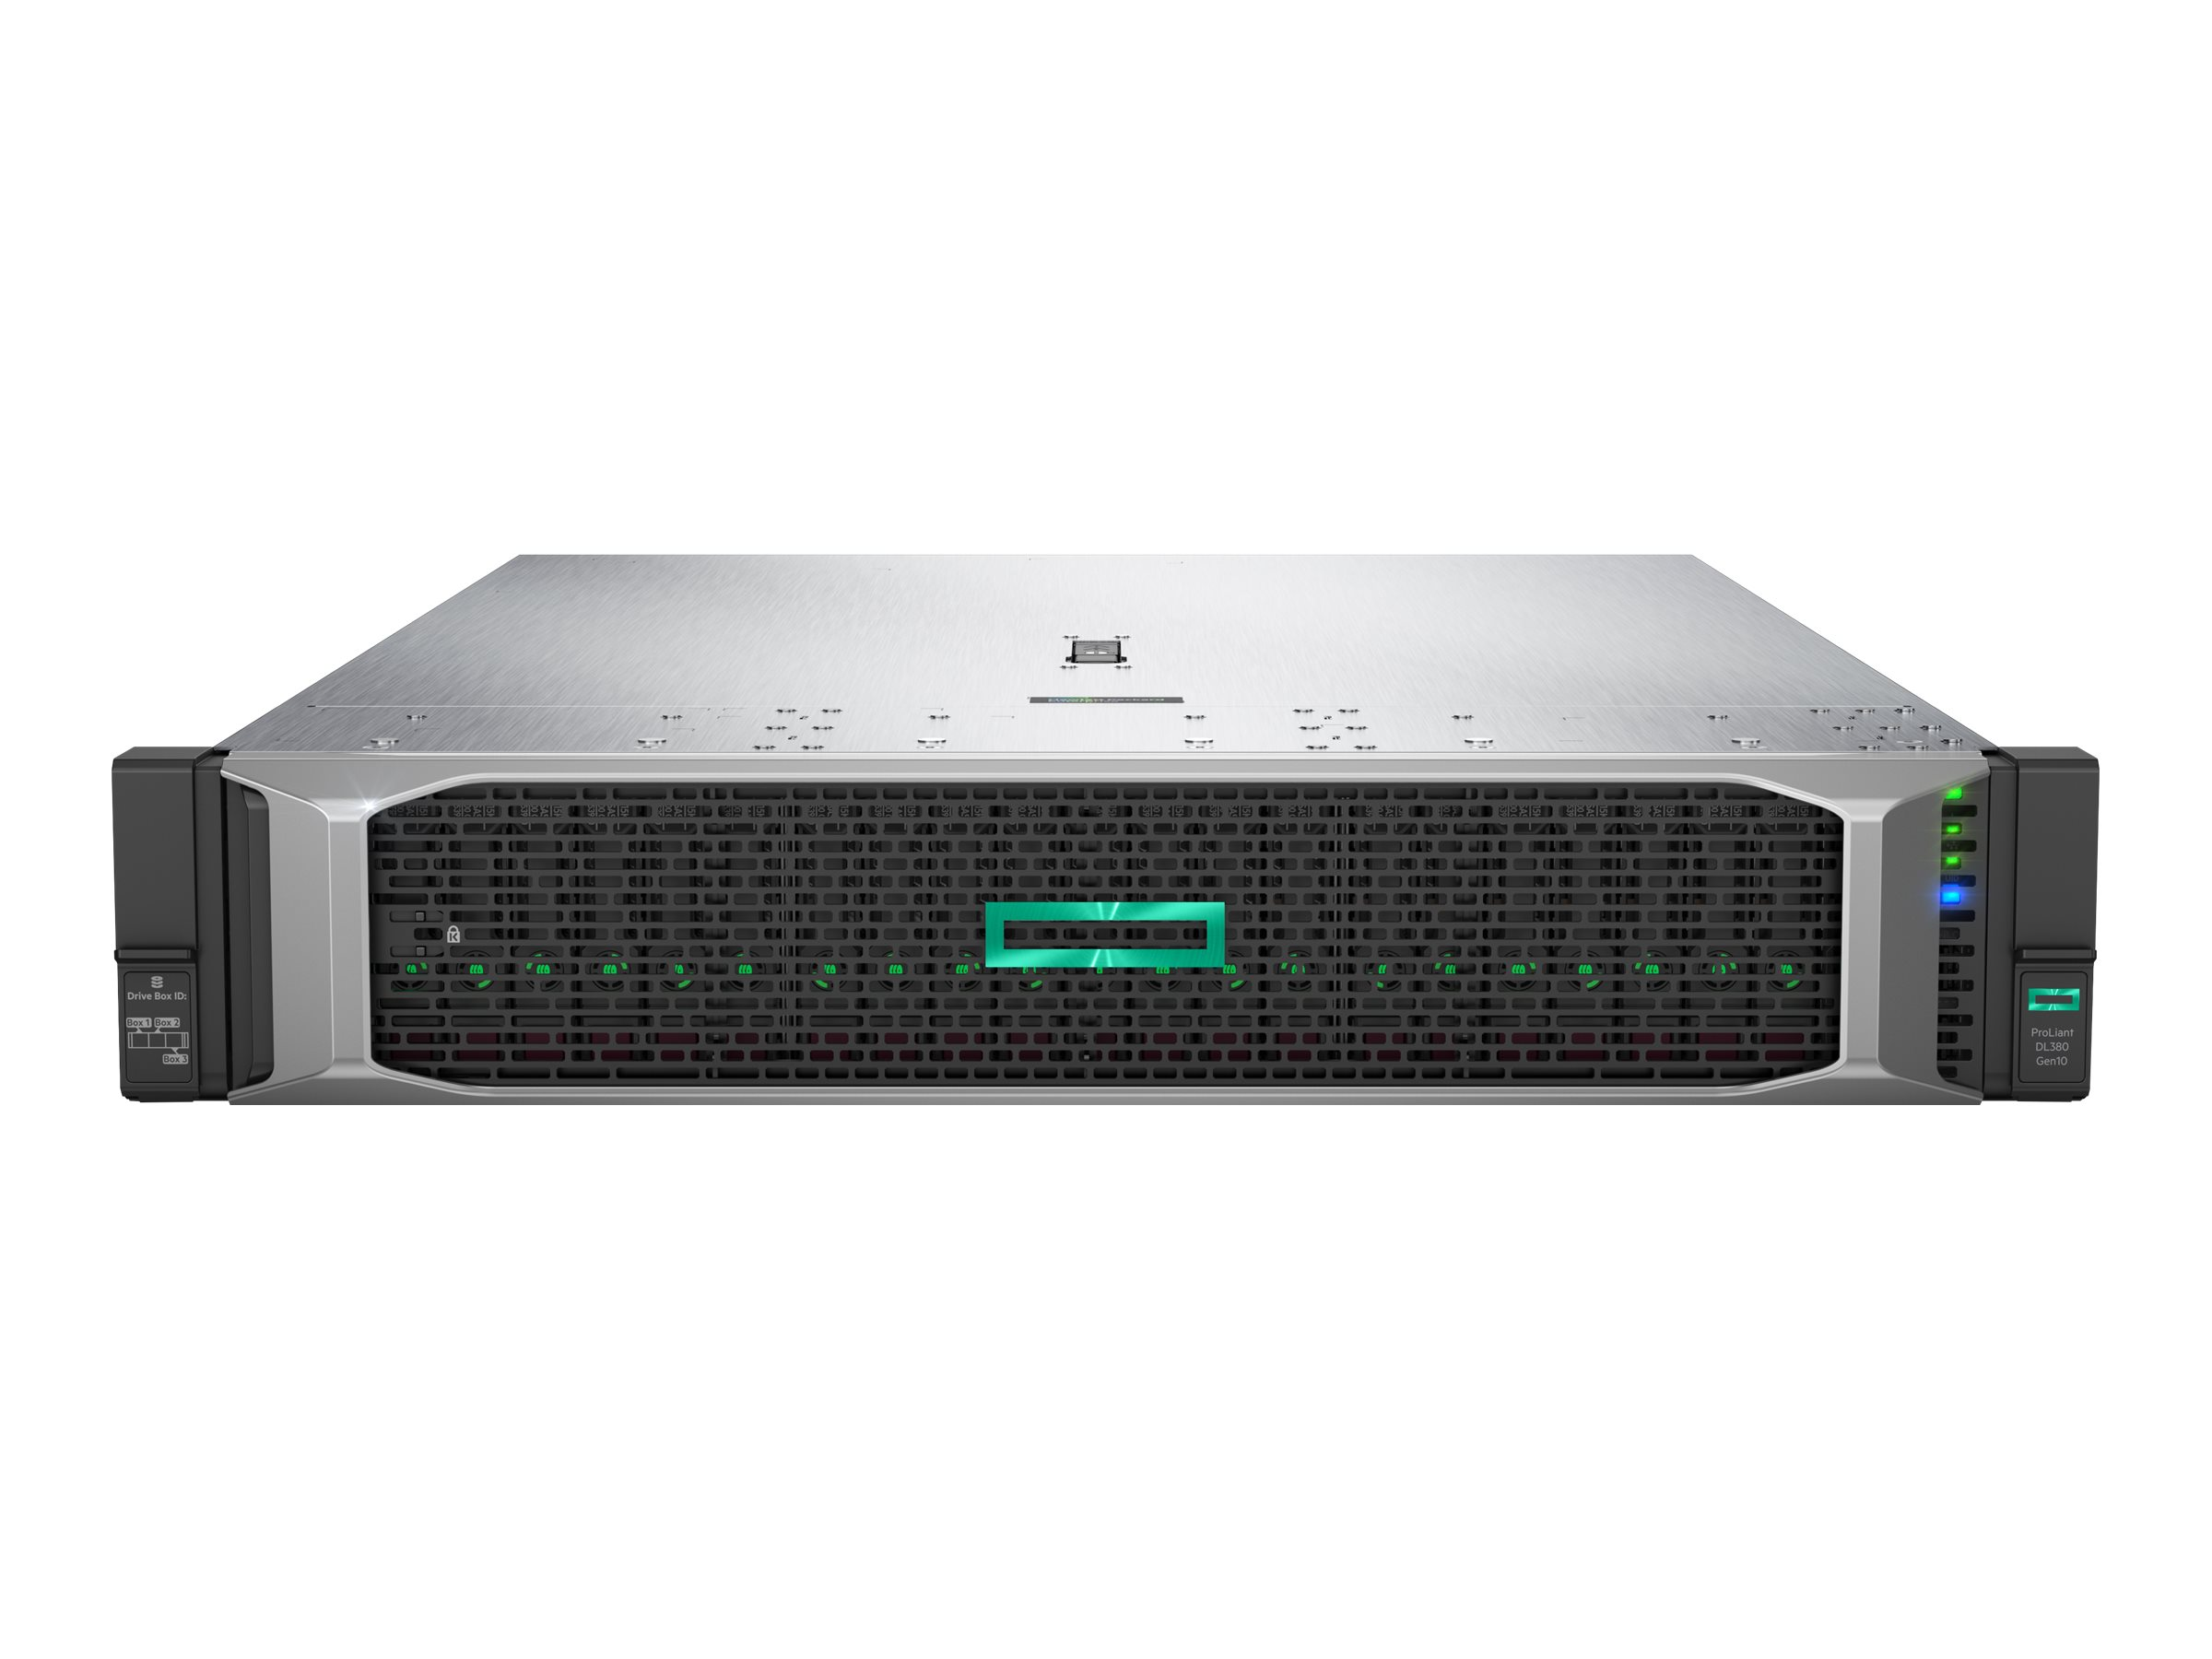 "HP Enterprise ProLiant DL380 Gen10 SMB - Server - Rack-Montage - 2U - zweiweg - 1 x Xeon Silver 4208 / 2.1 GHz - RAM 16 GB - SATA/SAS - Hot-Swap 6.4 cm (2.5"")"